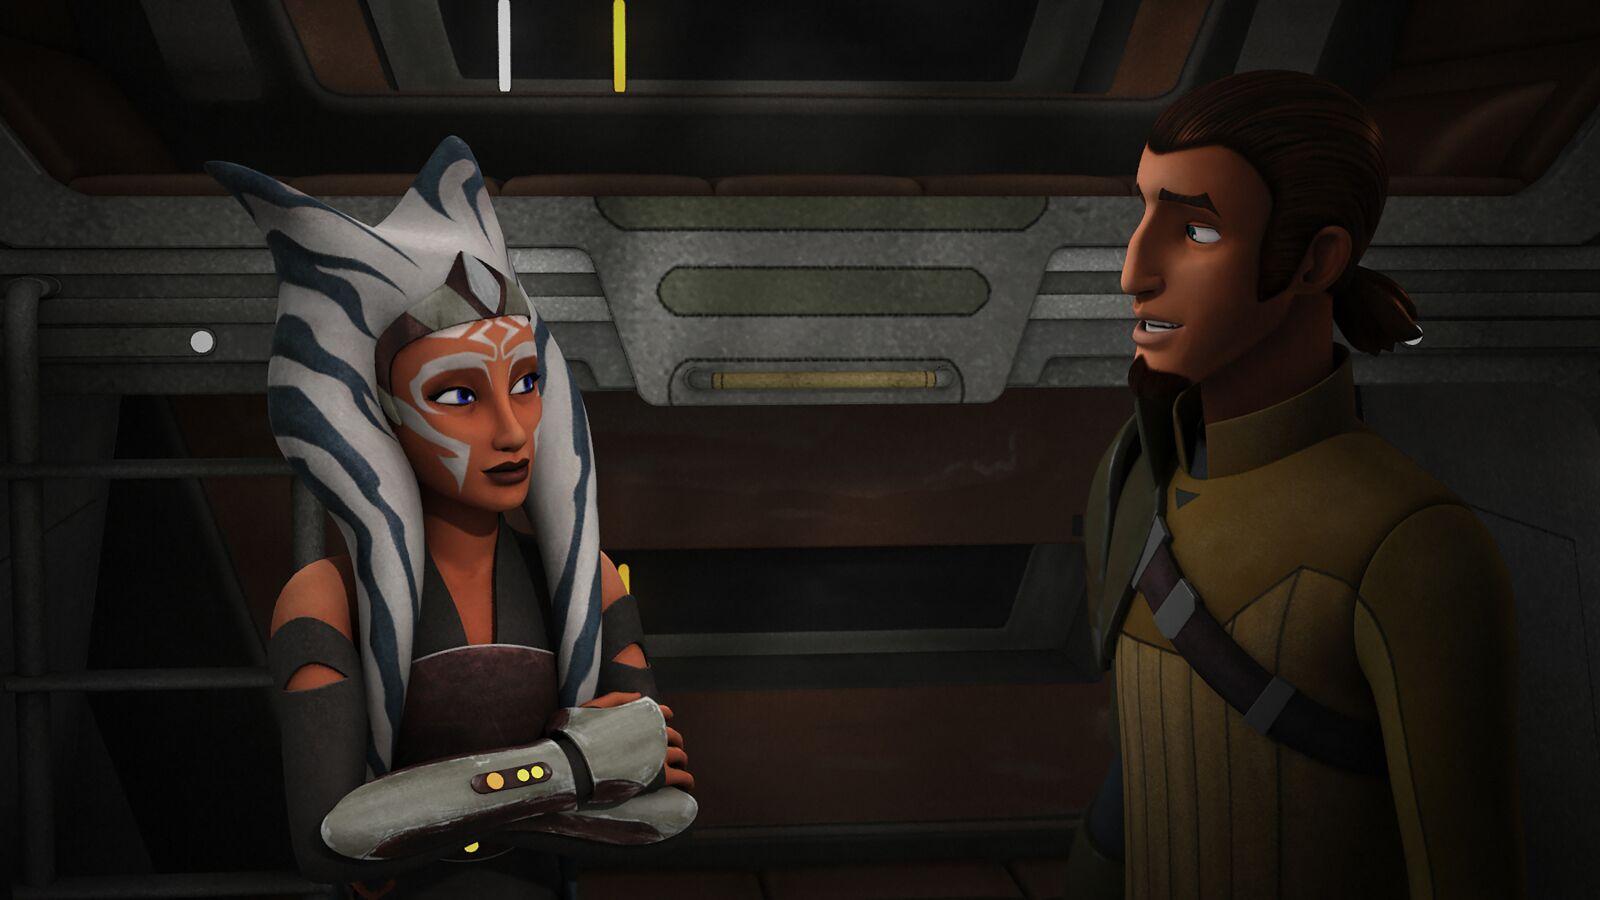 Star Wars: The Clone Wars season 7 premieres on Disney Plus in February 2020